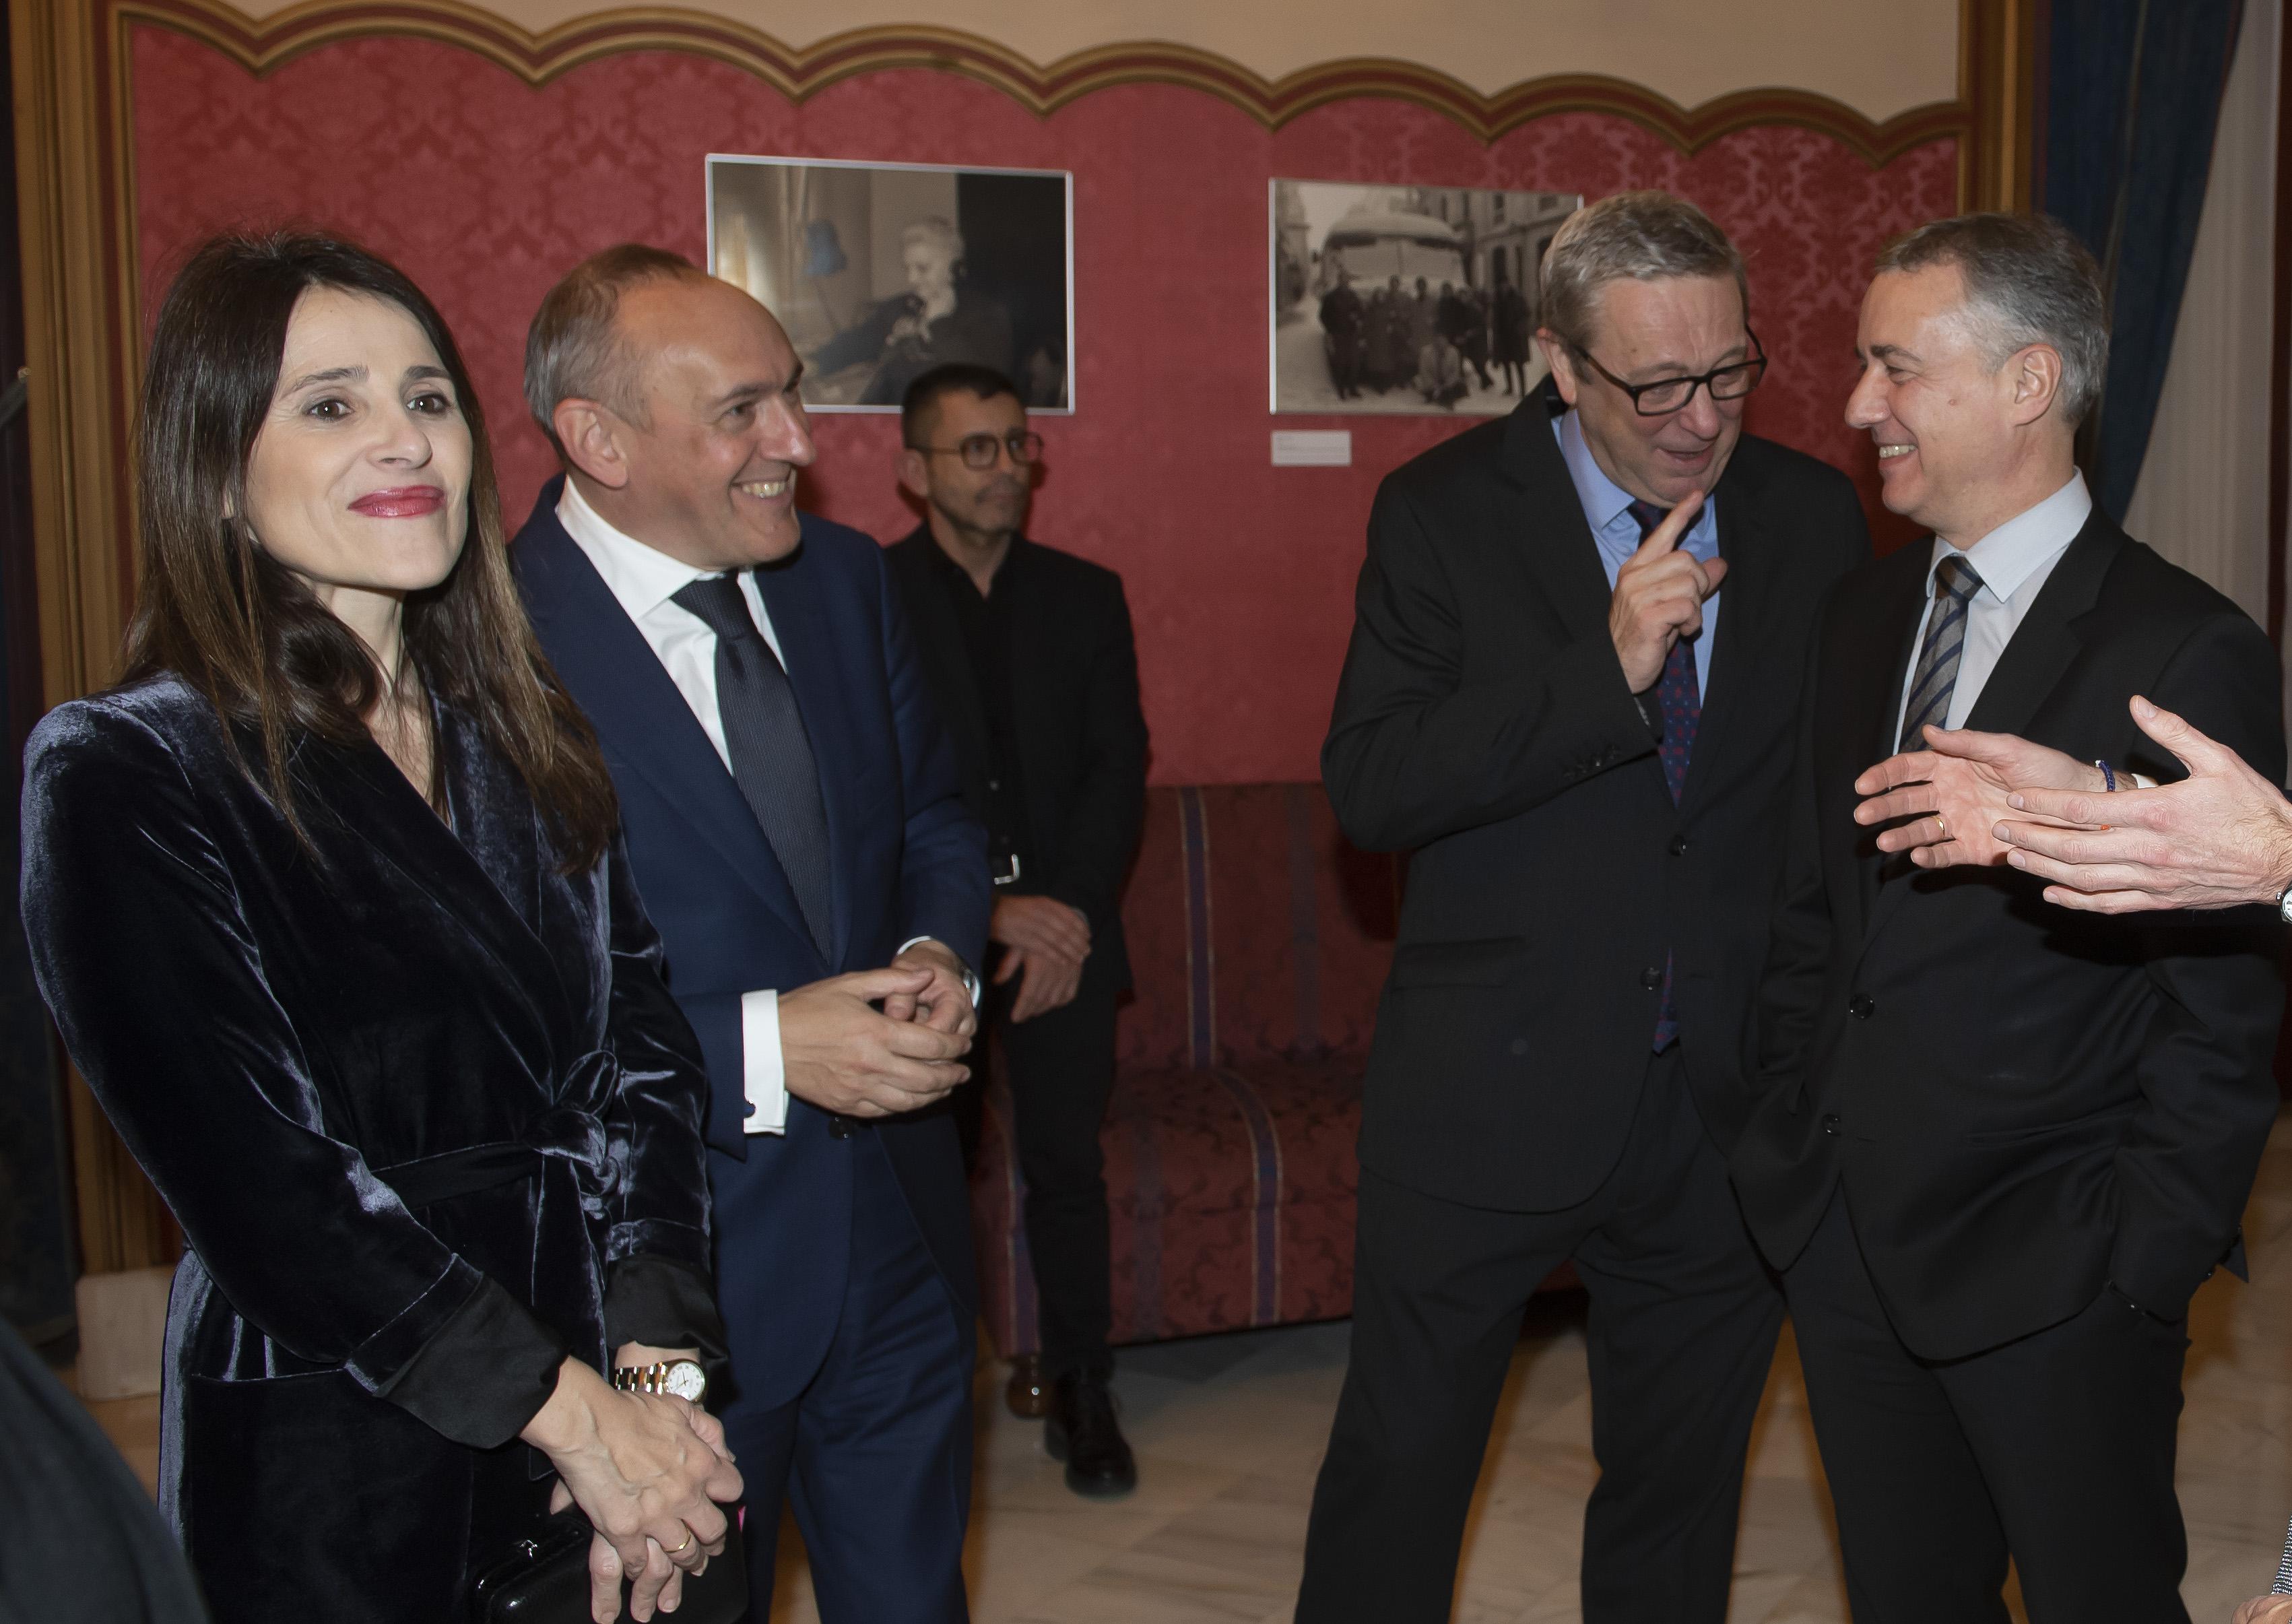 2018_12_14_lhk_centenario_teatro_principal_05.jpg